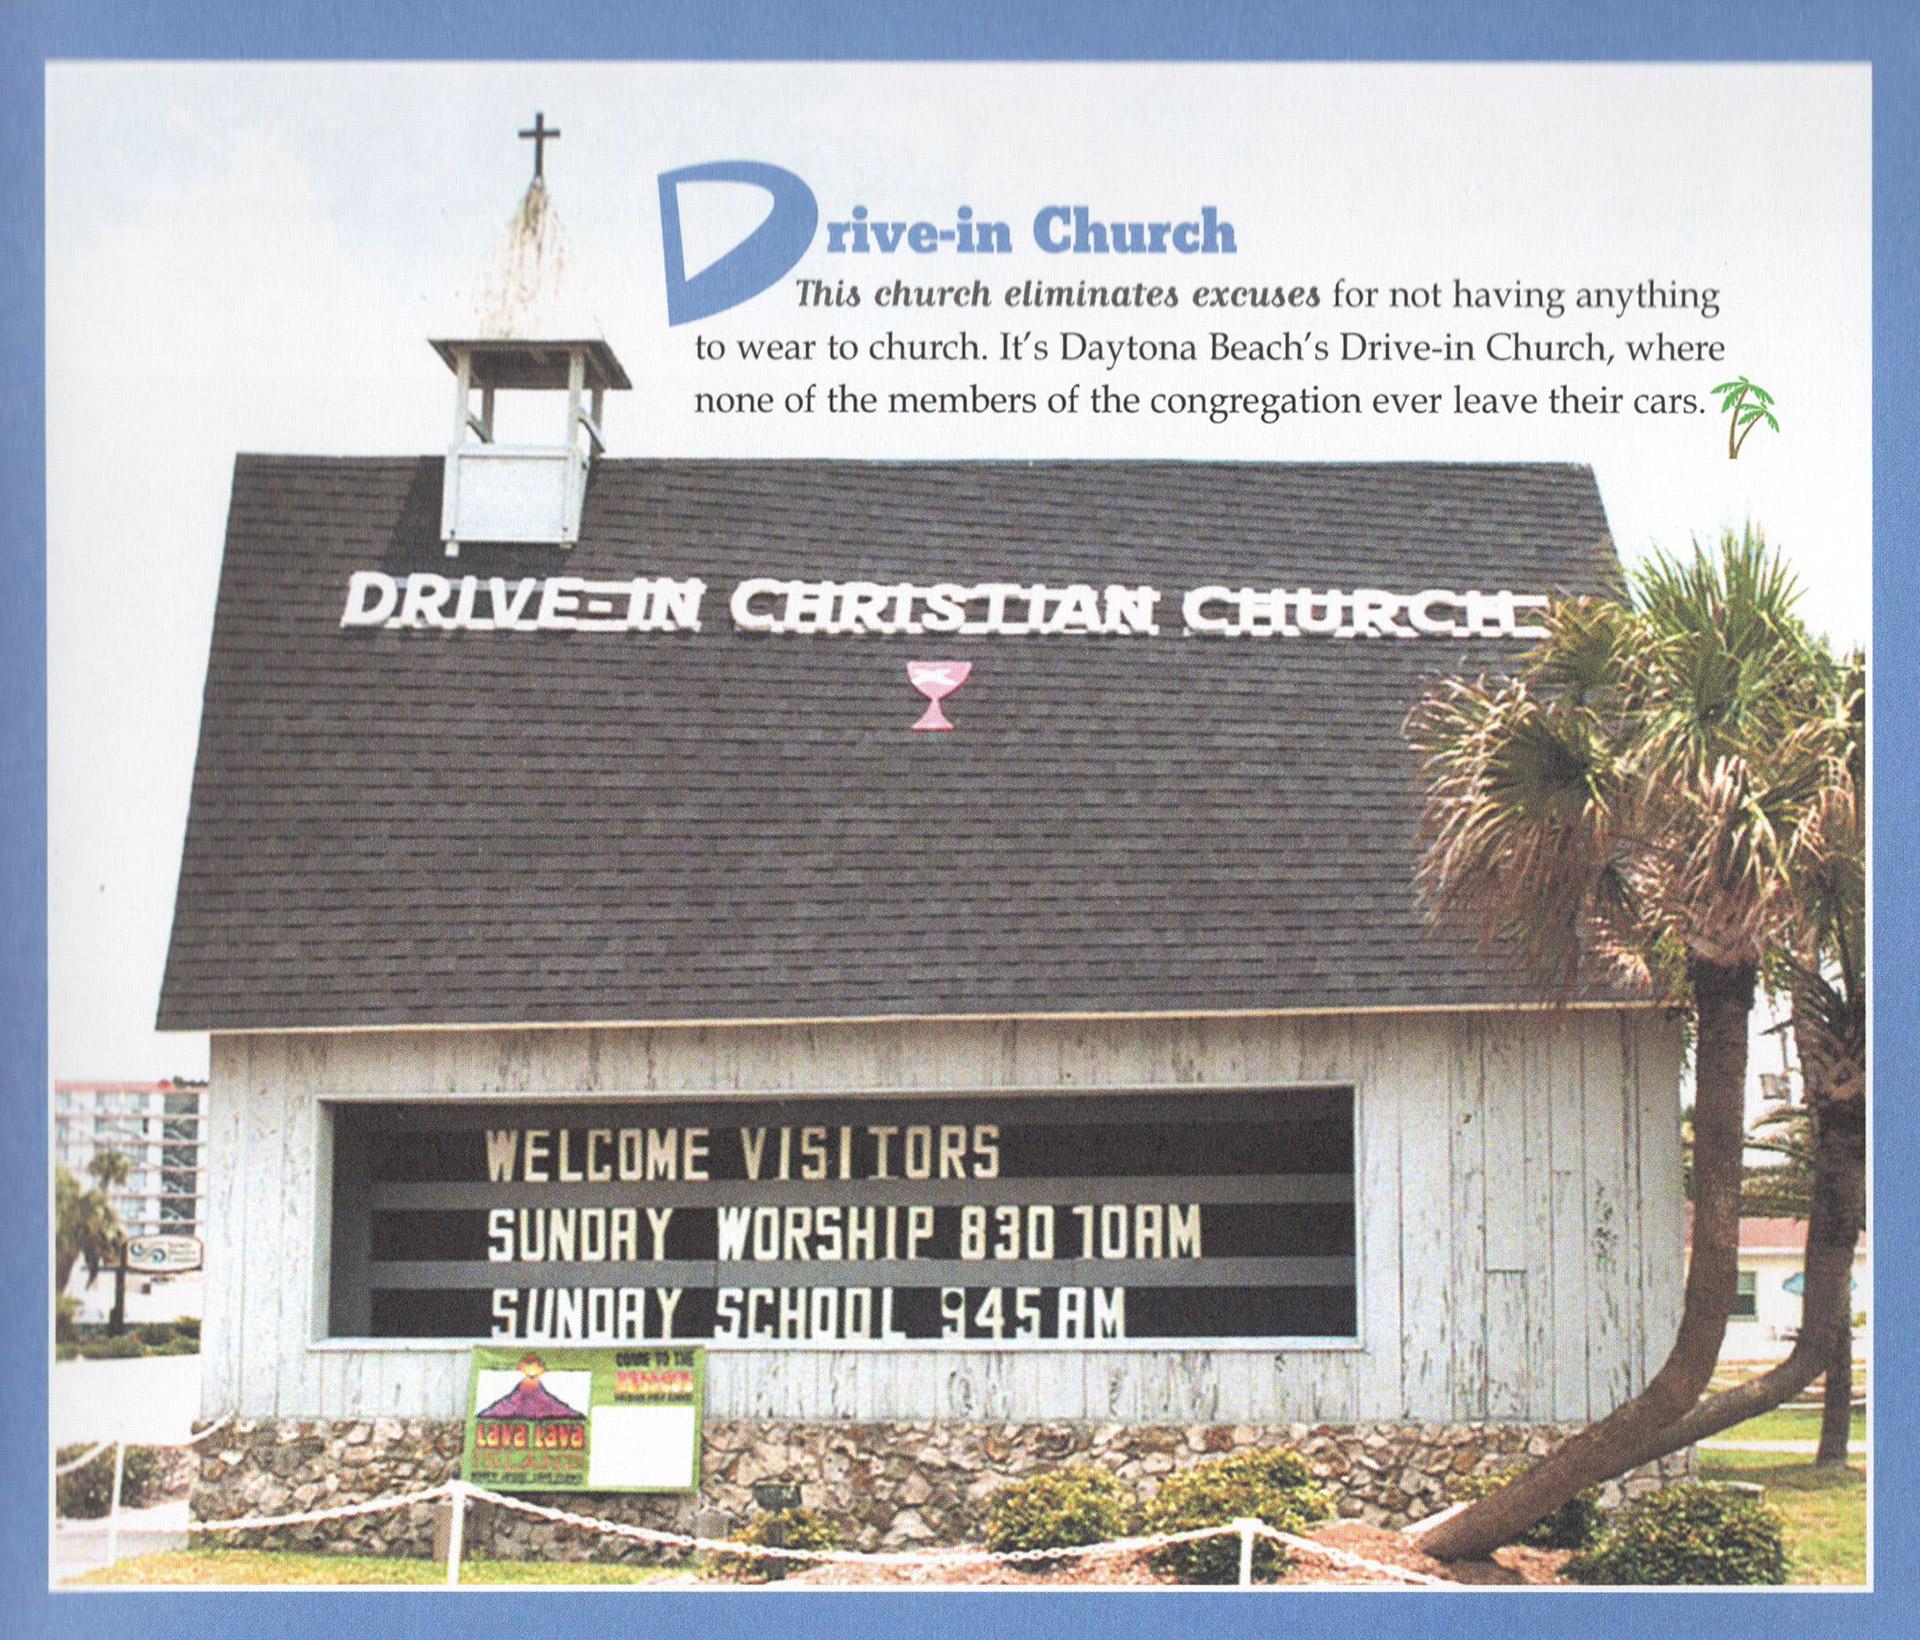 Drive-In Christian Church